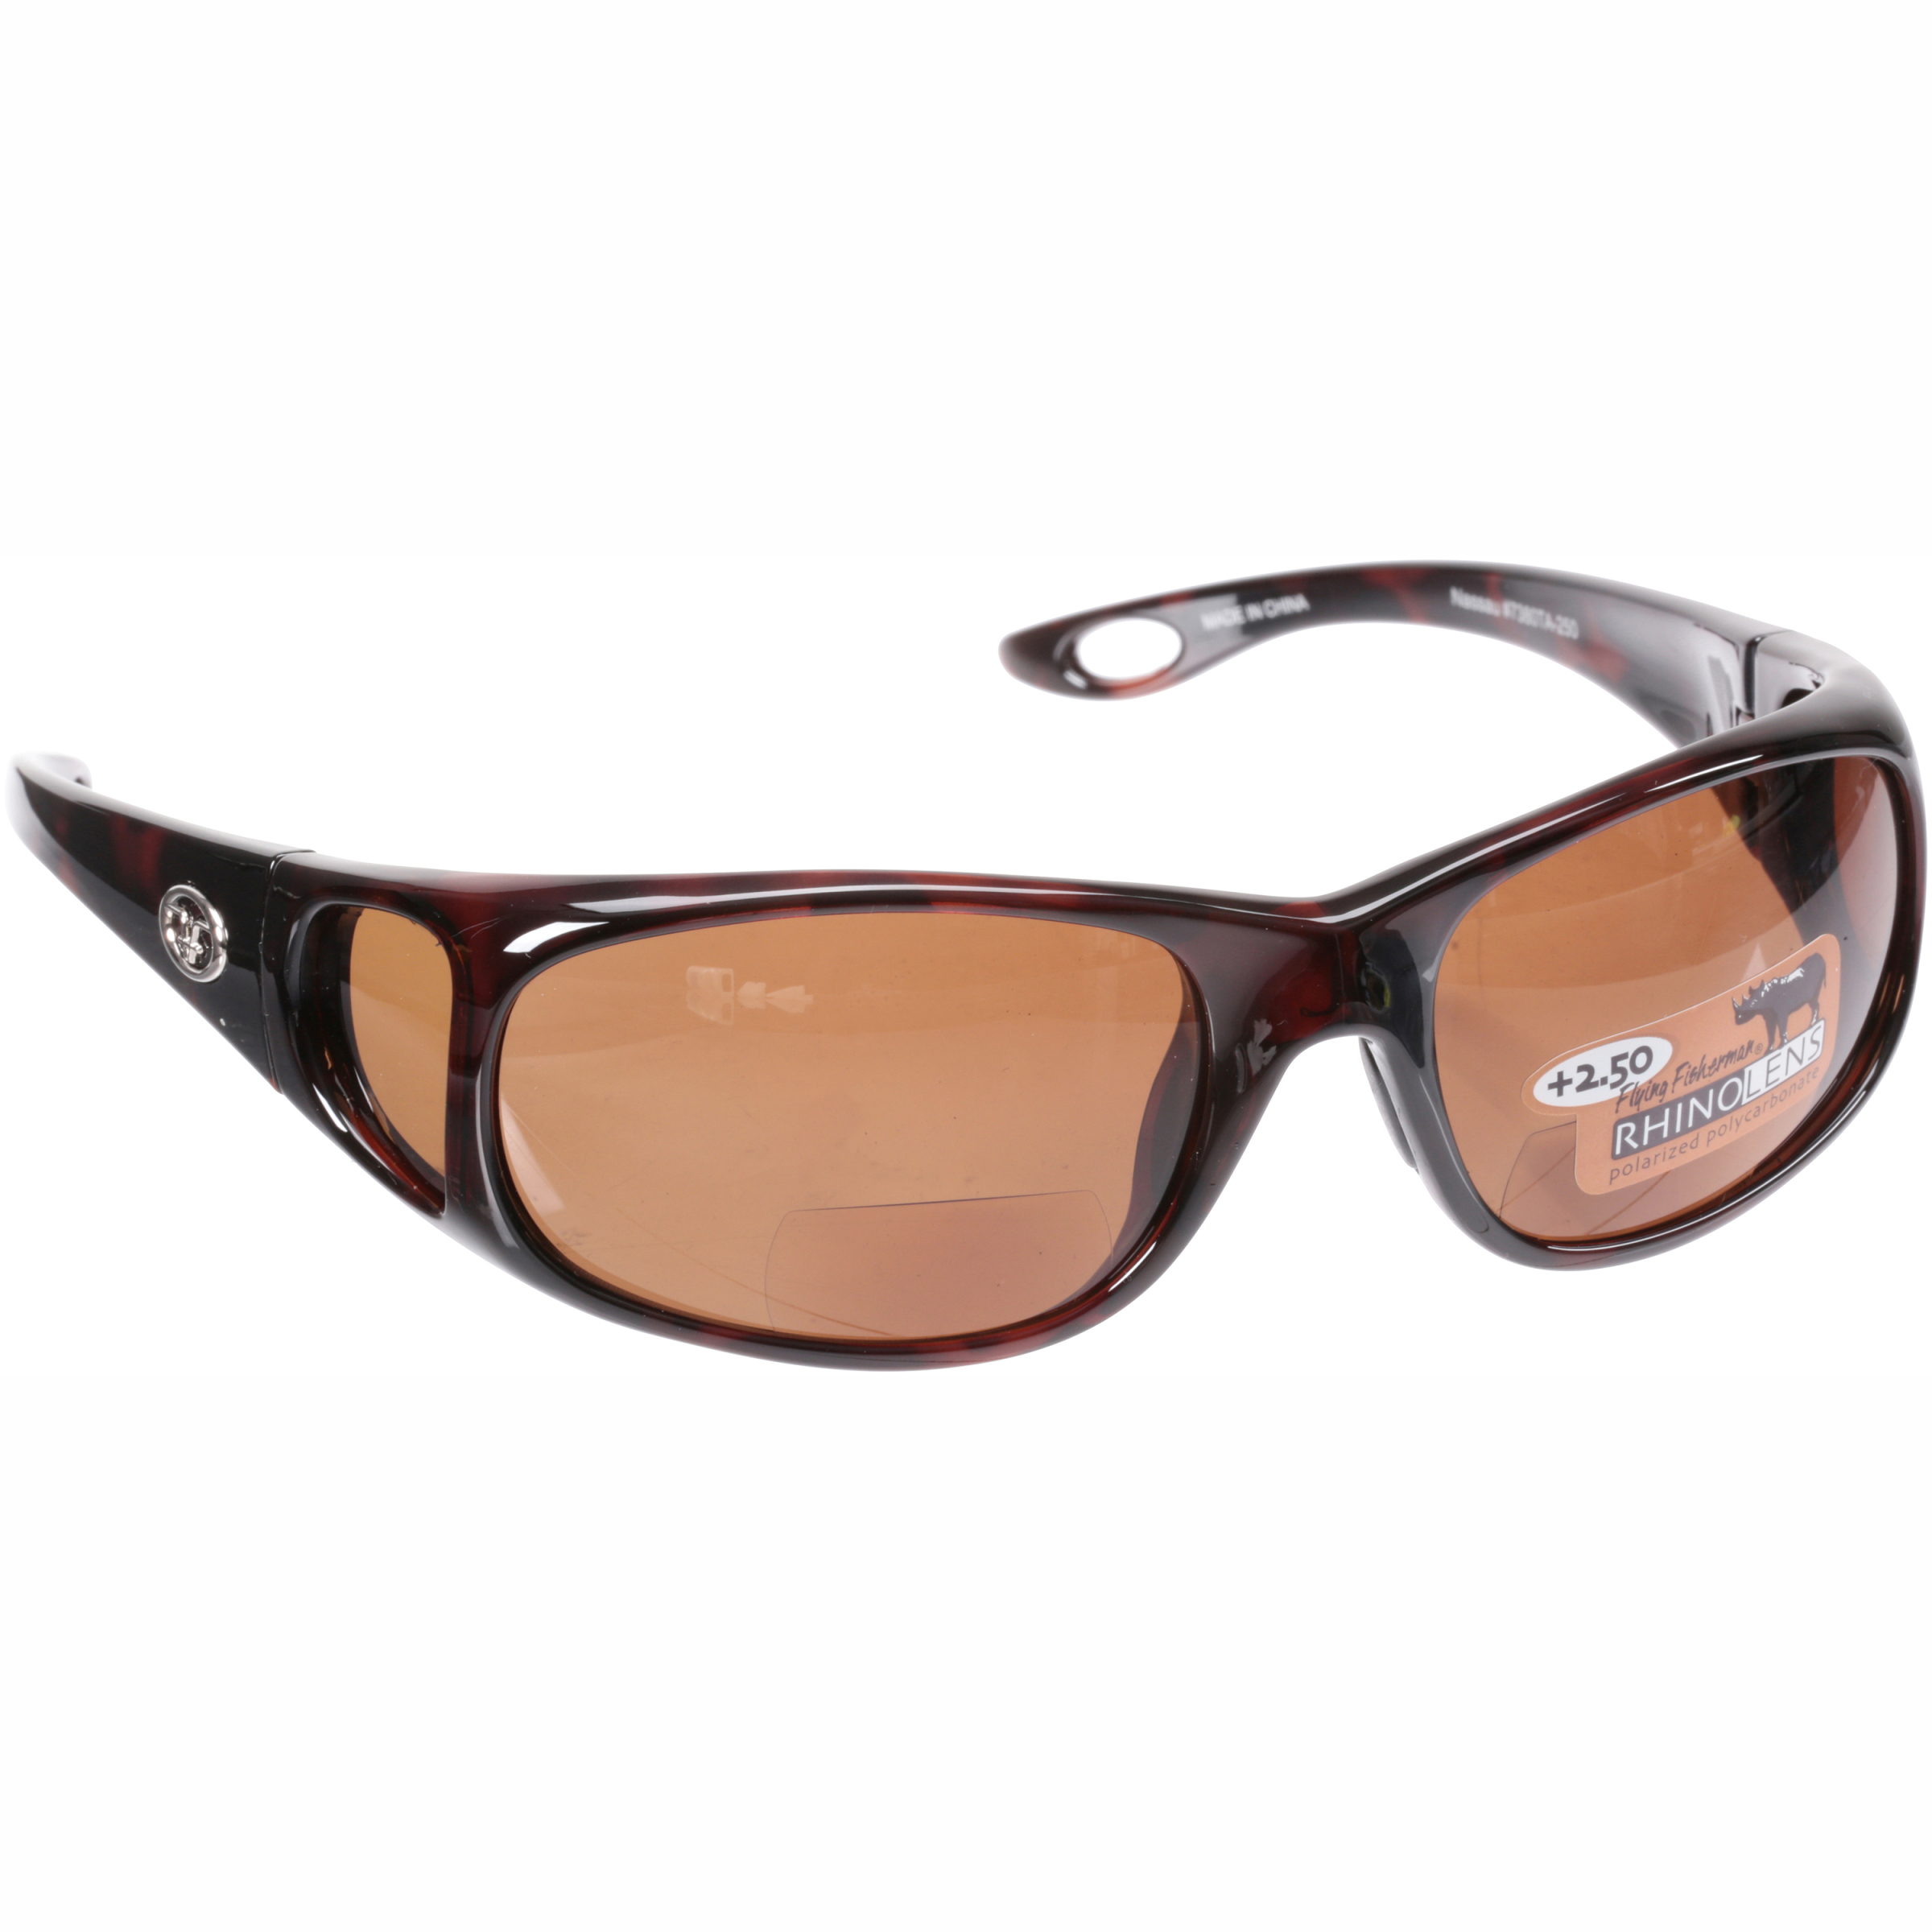 7db56422cc Flying Fisherman Nassau Polarized Sunglasses   Bifocal Reader - Walmart.com